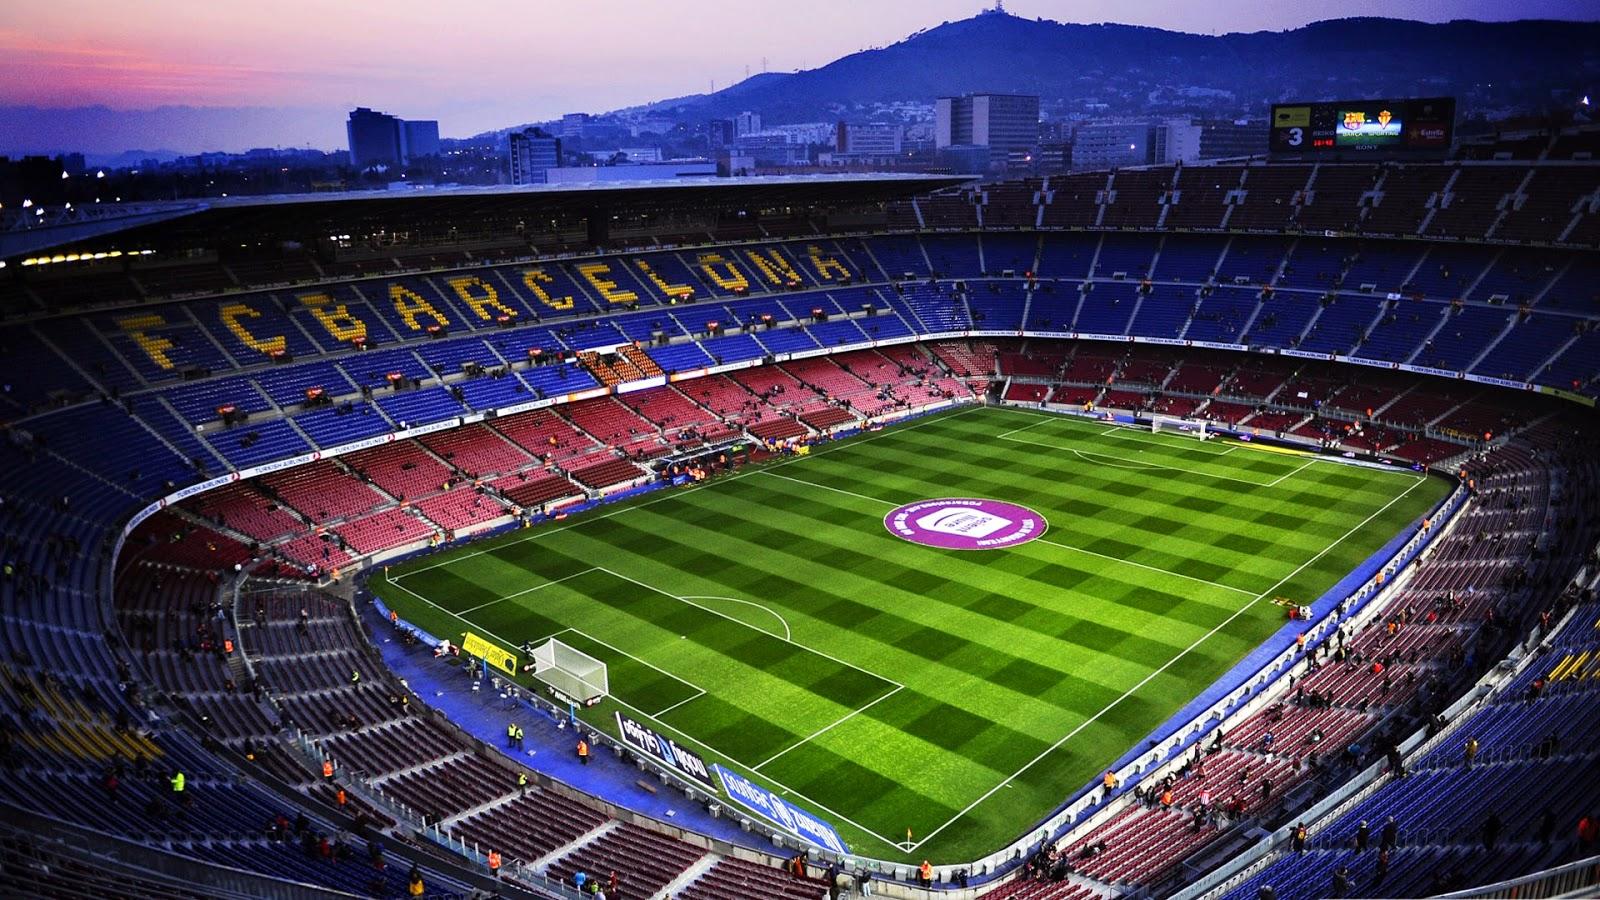 Wallpaper Strawberry Cute Stadium Camp Nou Barcelona Spain Dream Wallpapers